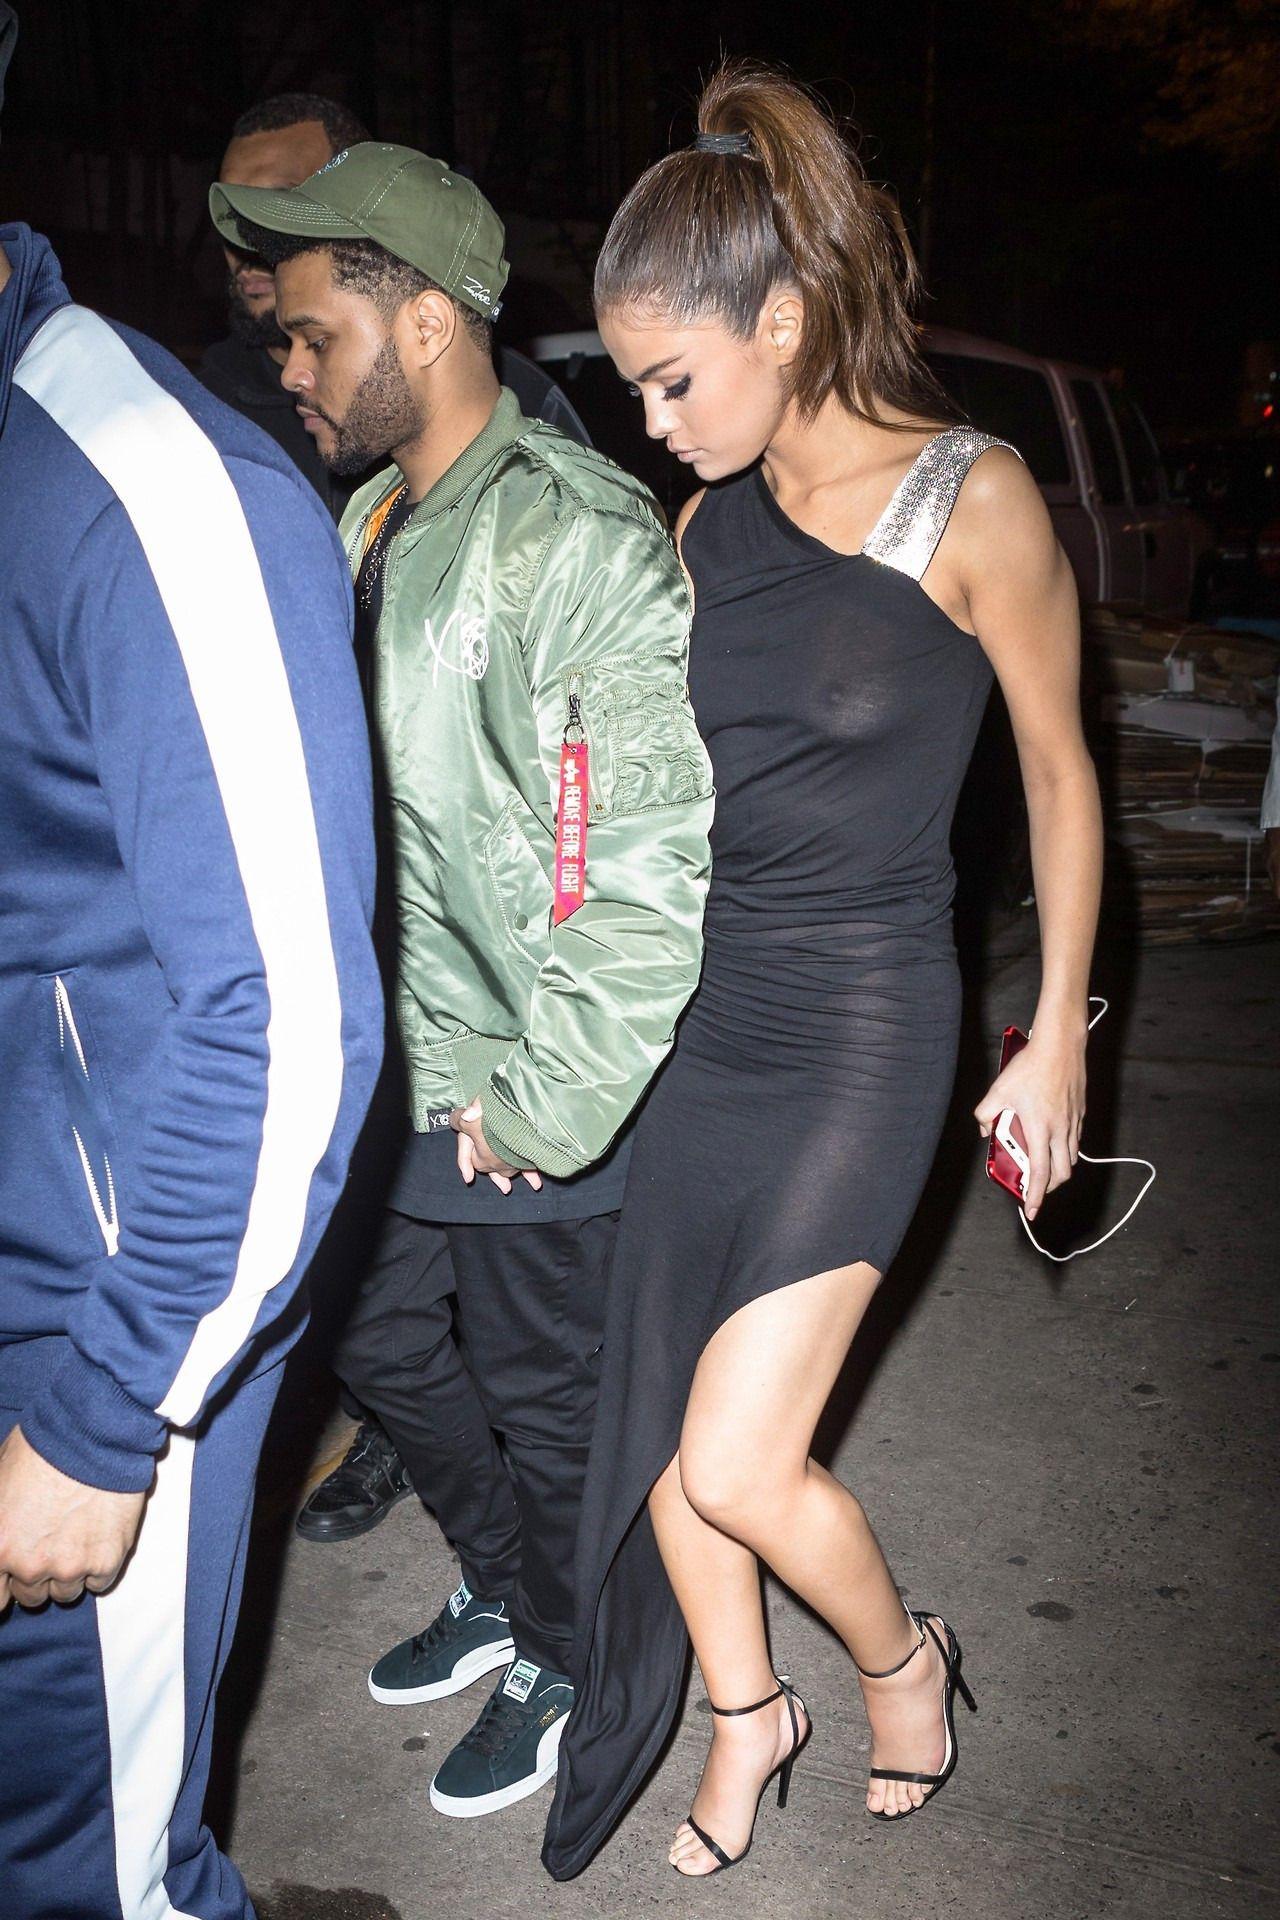 Selena Gomez News — June 7: [More] Selena leaving a restaurant with...